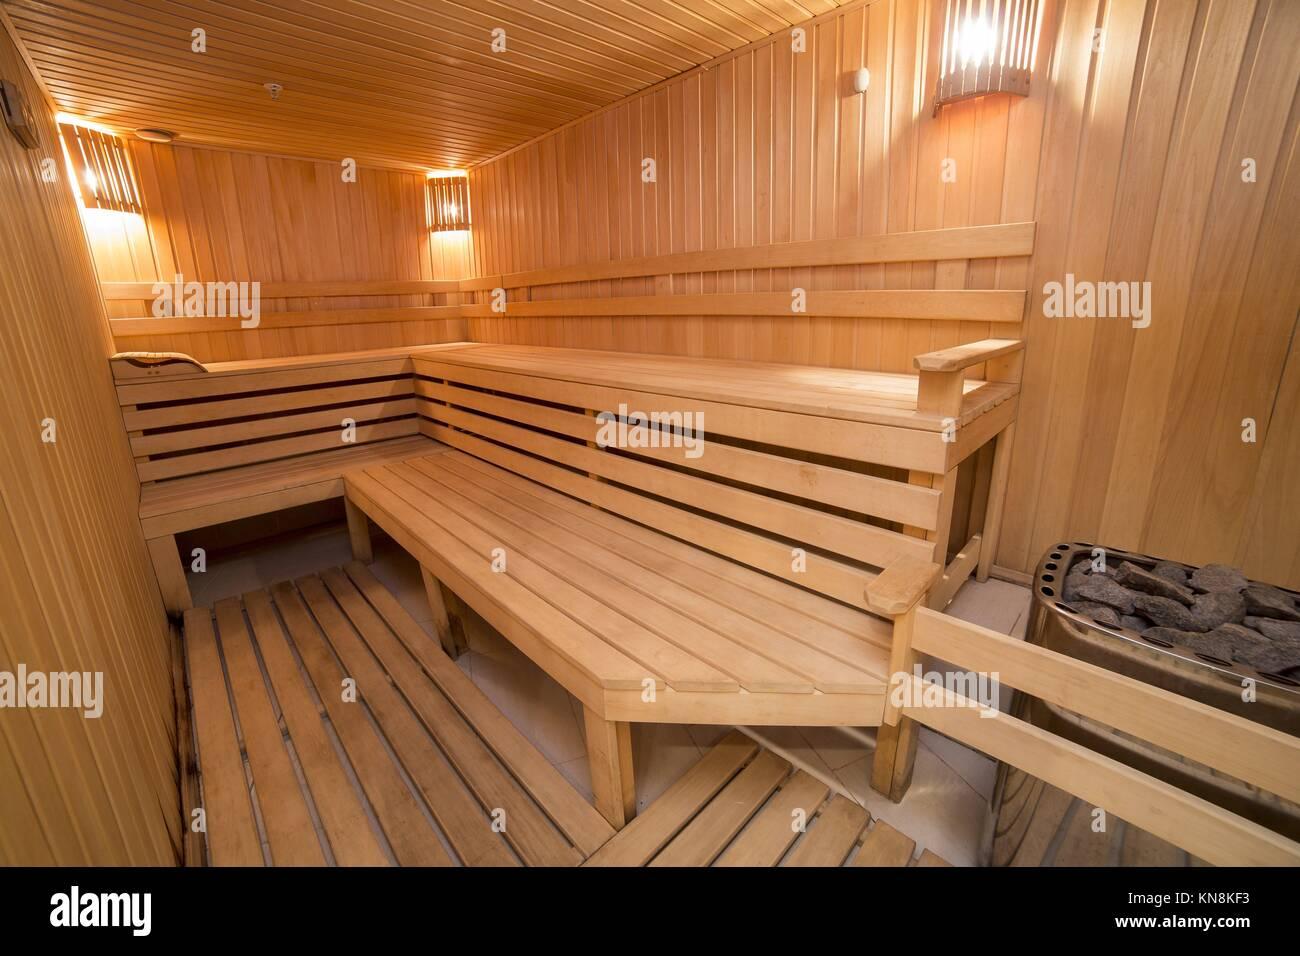 Swell Sauna Interior Comfortable Wooden Room Spa Indoors Bath Machost Co Dining Chair Design Ideas Machostcouk